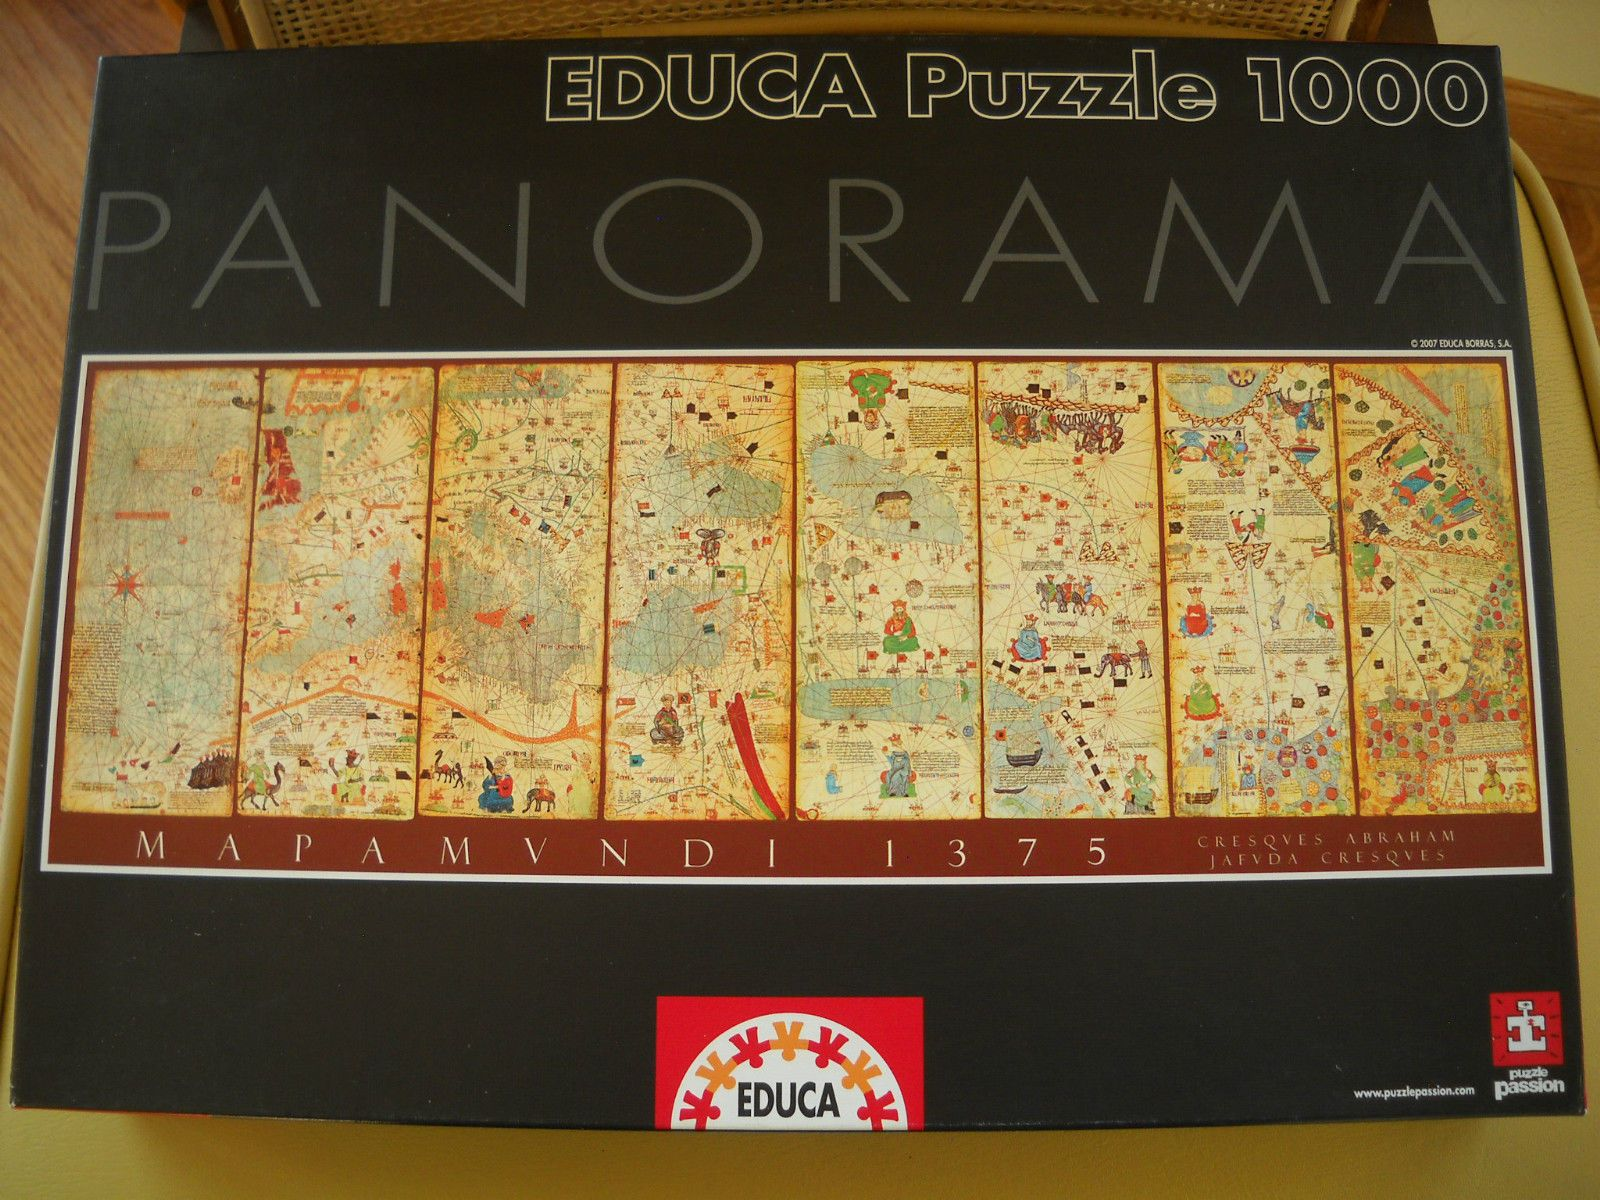 Educa puzzle mapa mundi 1375 world map 1000 pc panorama 96x34cm educa puzzle mapa mundi 1375 world map 1000 pc panorama 96x34cm ebay 17 total gumiabroncs Images